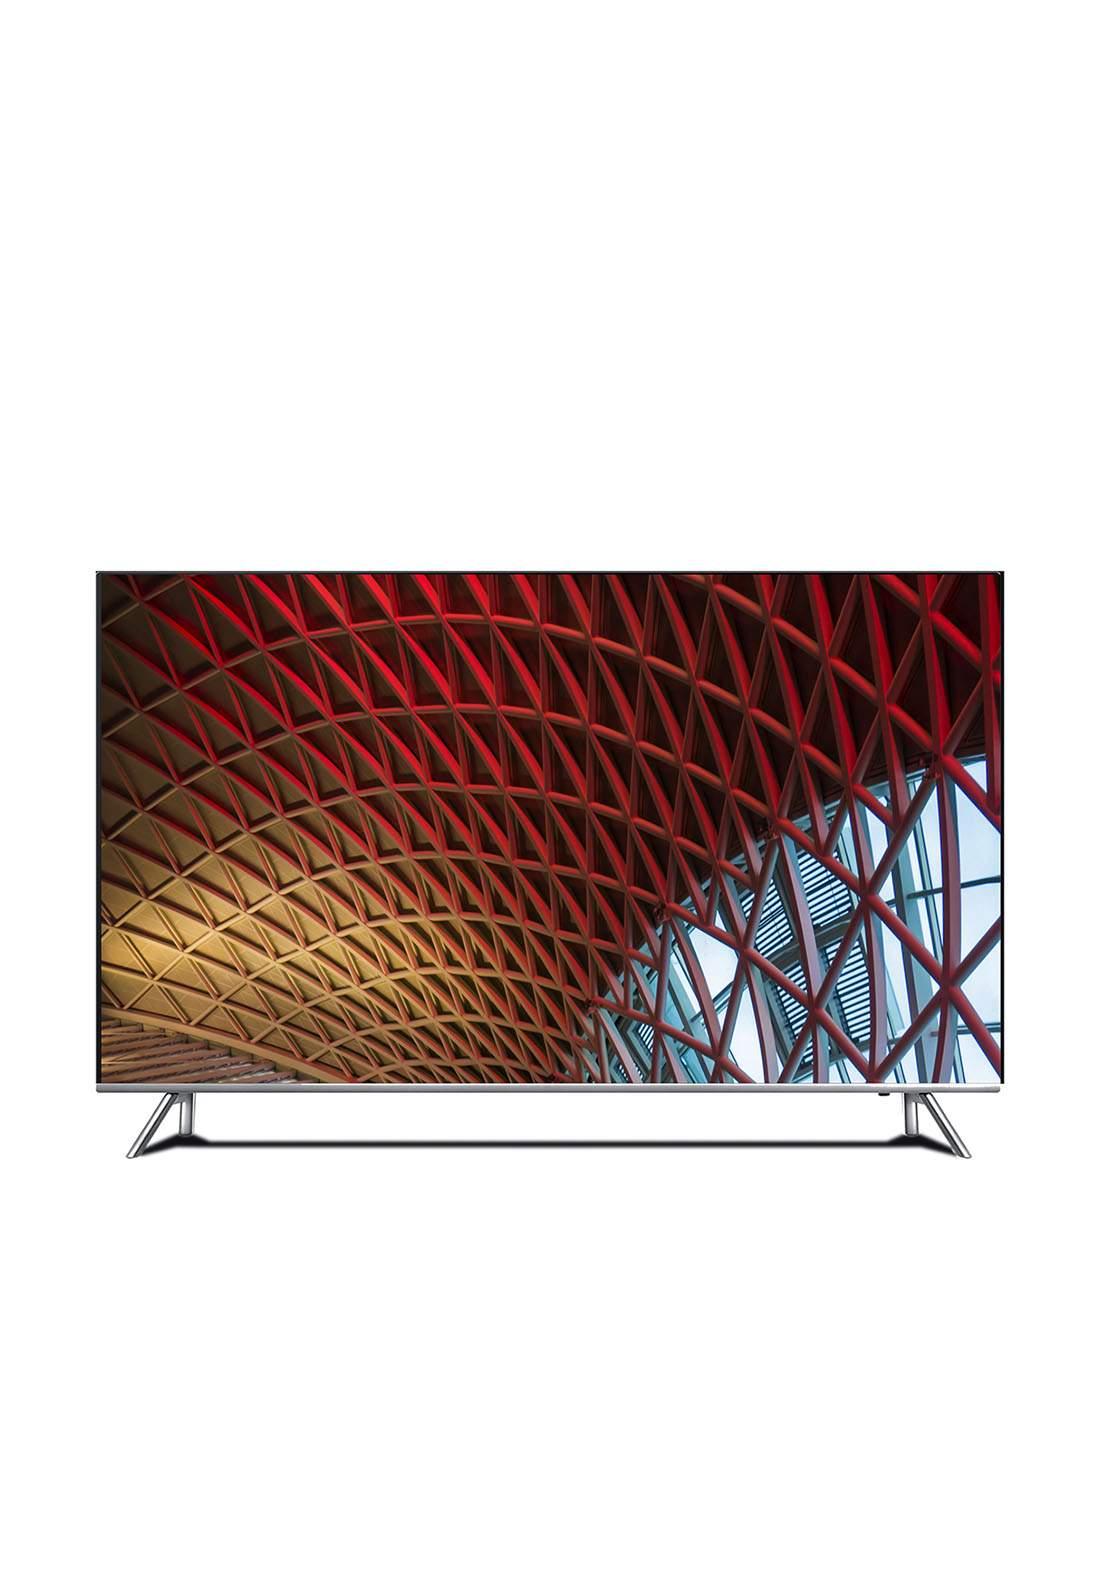 Shark Smart Led Tv - 58inch 4K شاشة ذكية مقوسة